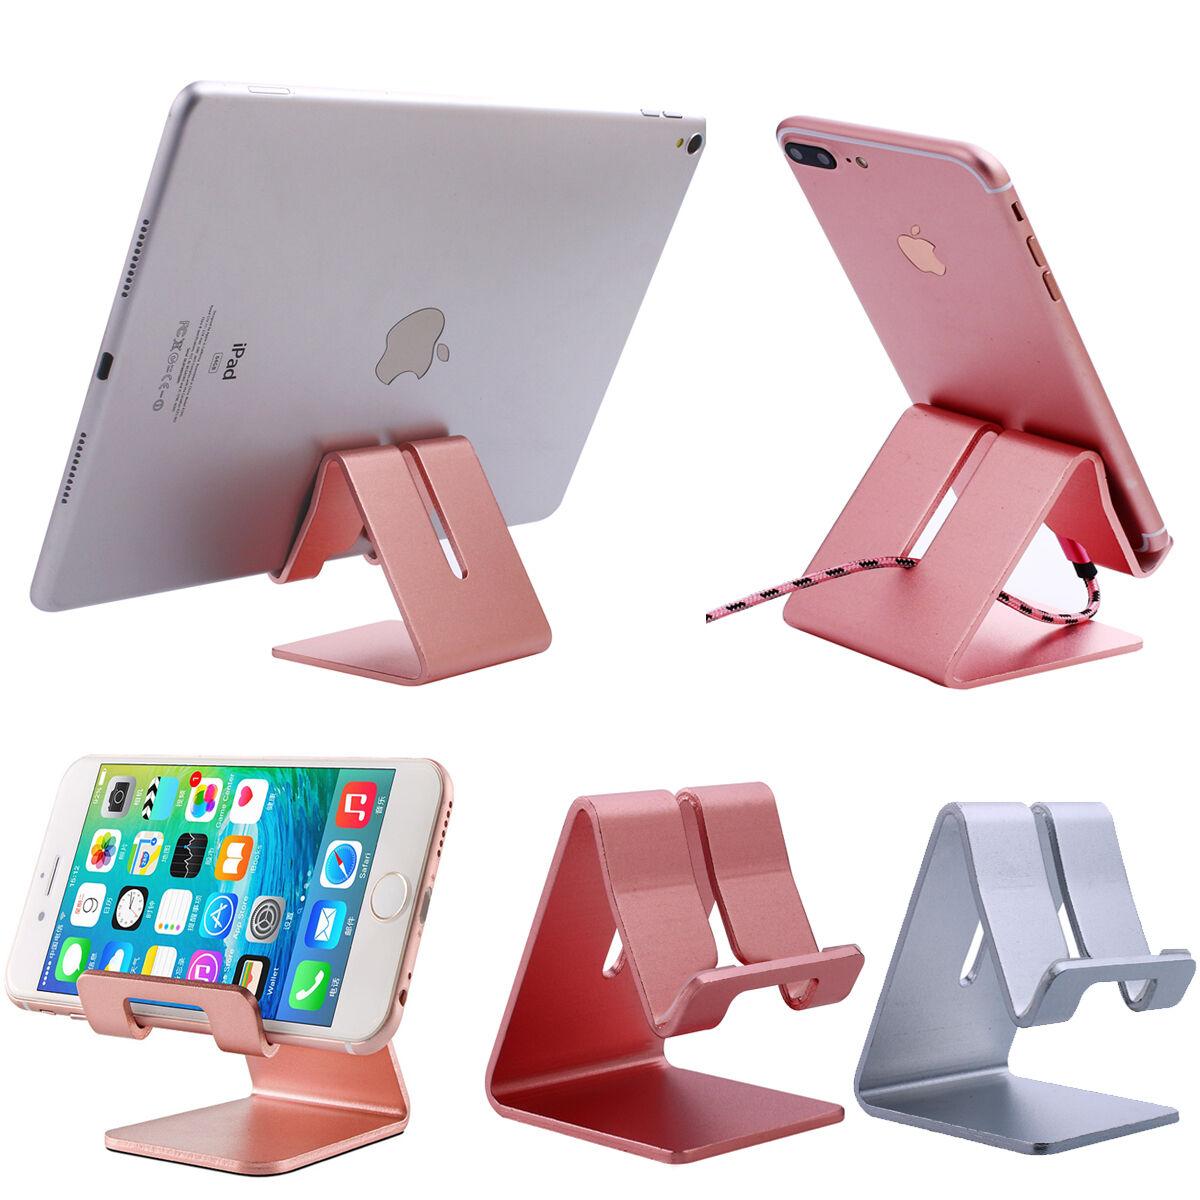 Universal Aluminum Phone Tablet Desk Stand Mount Holder For